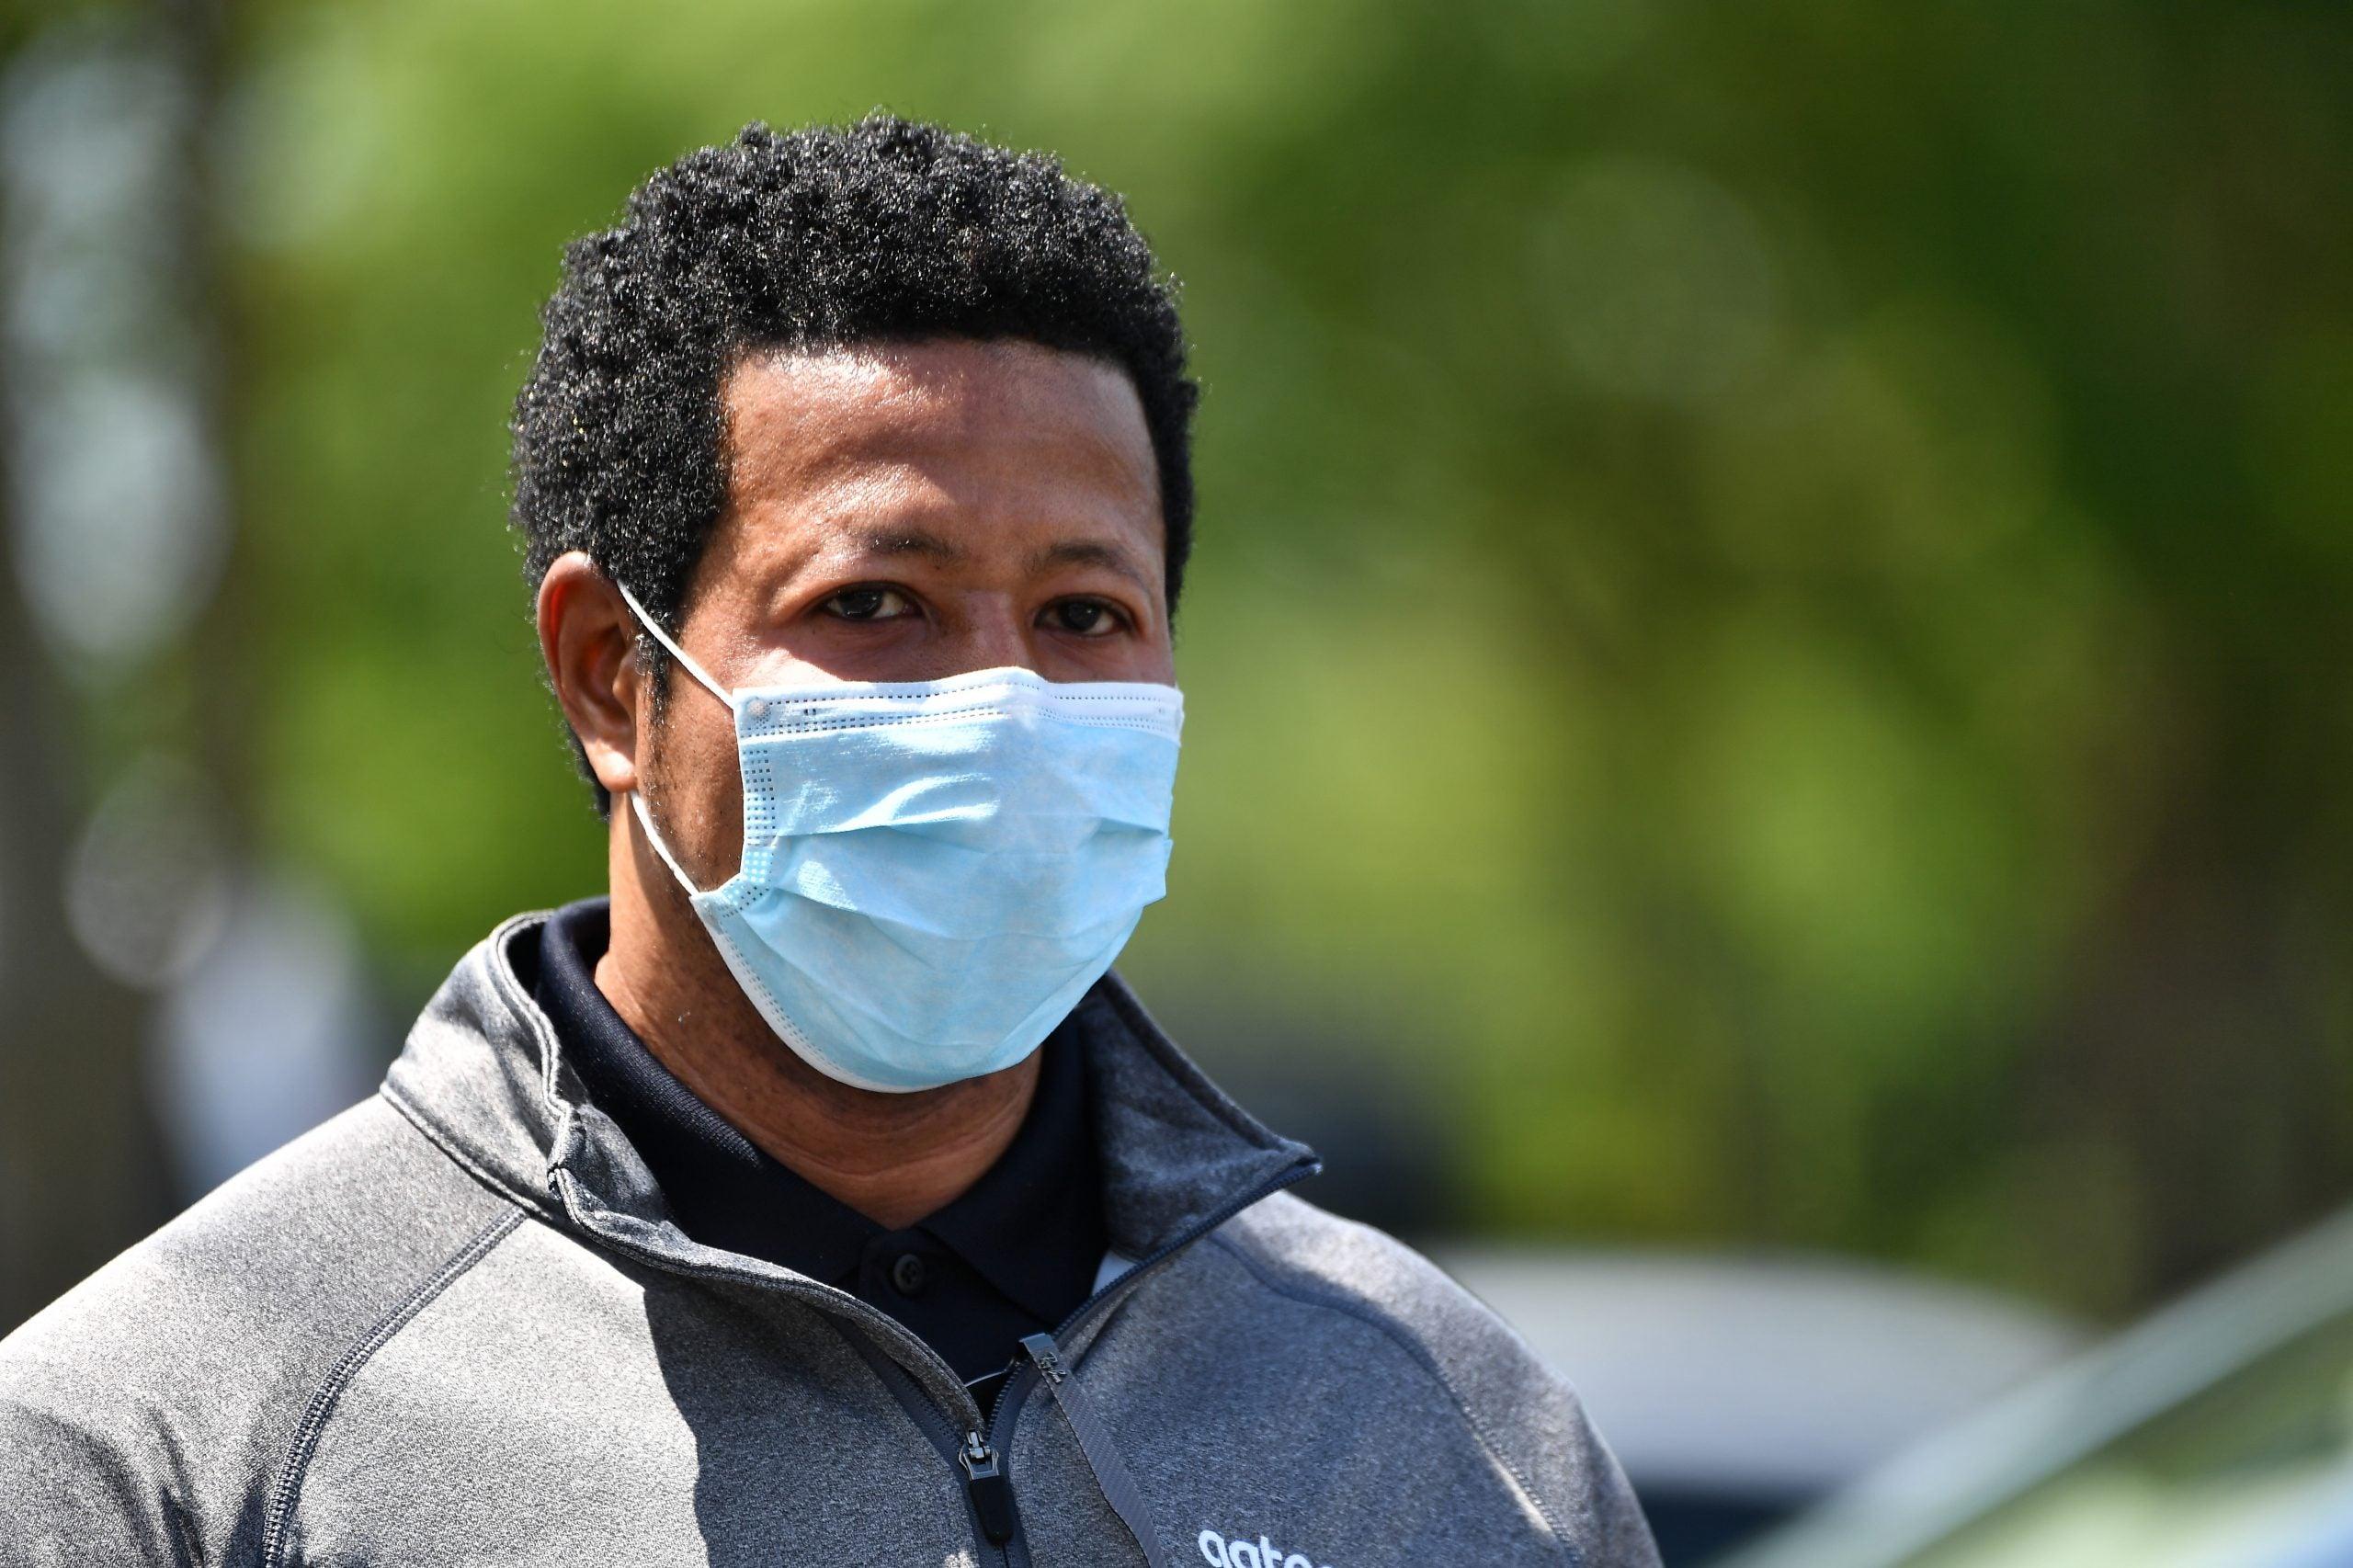 Atlanta resident wears mask before Kemp reverses mask mandate